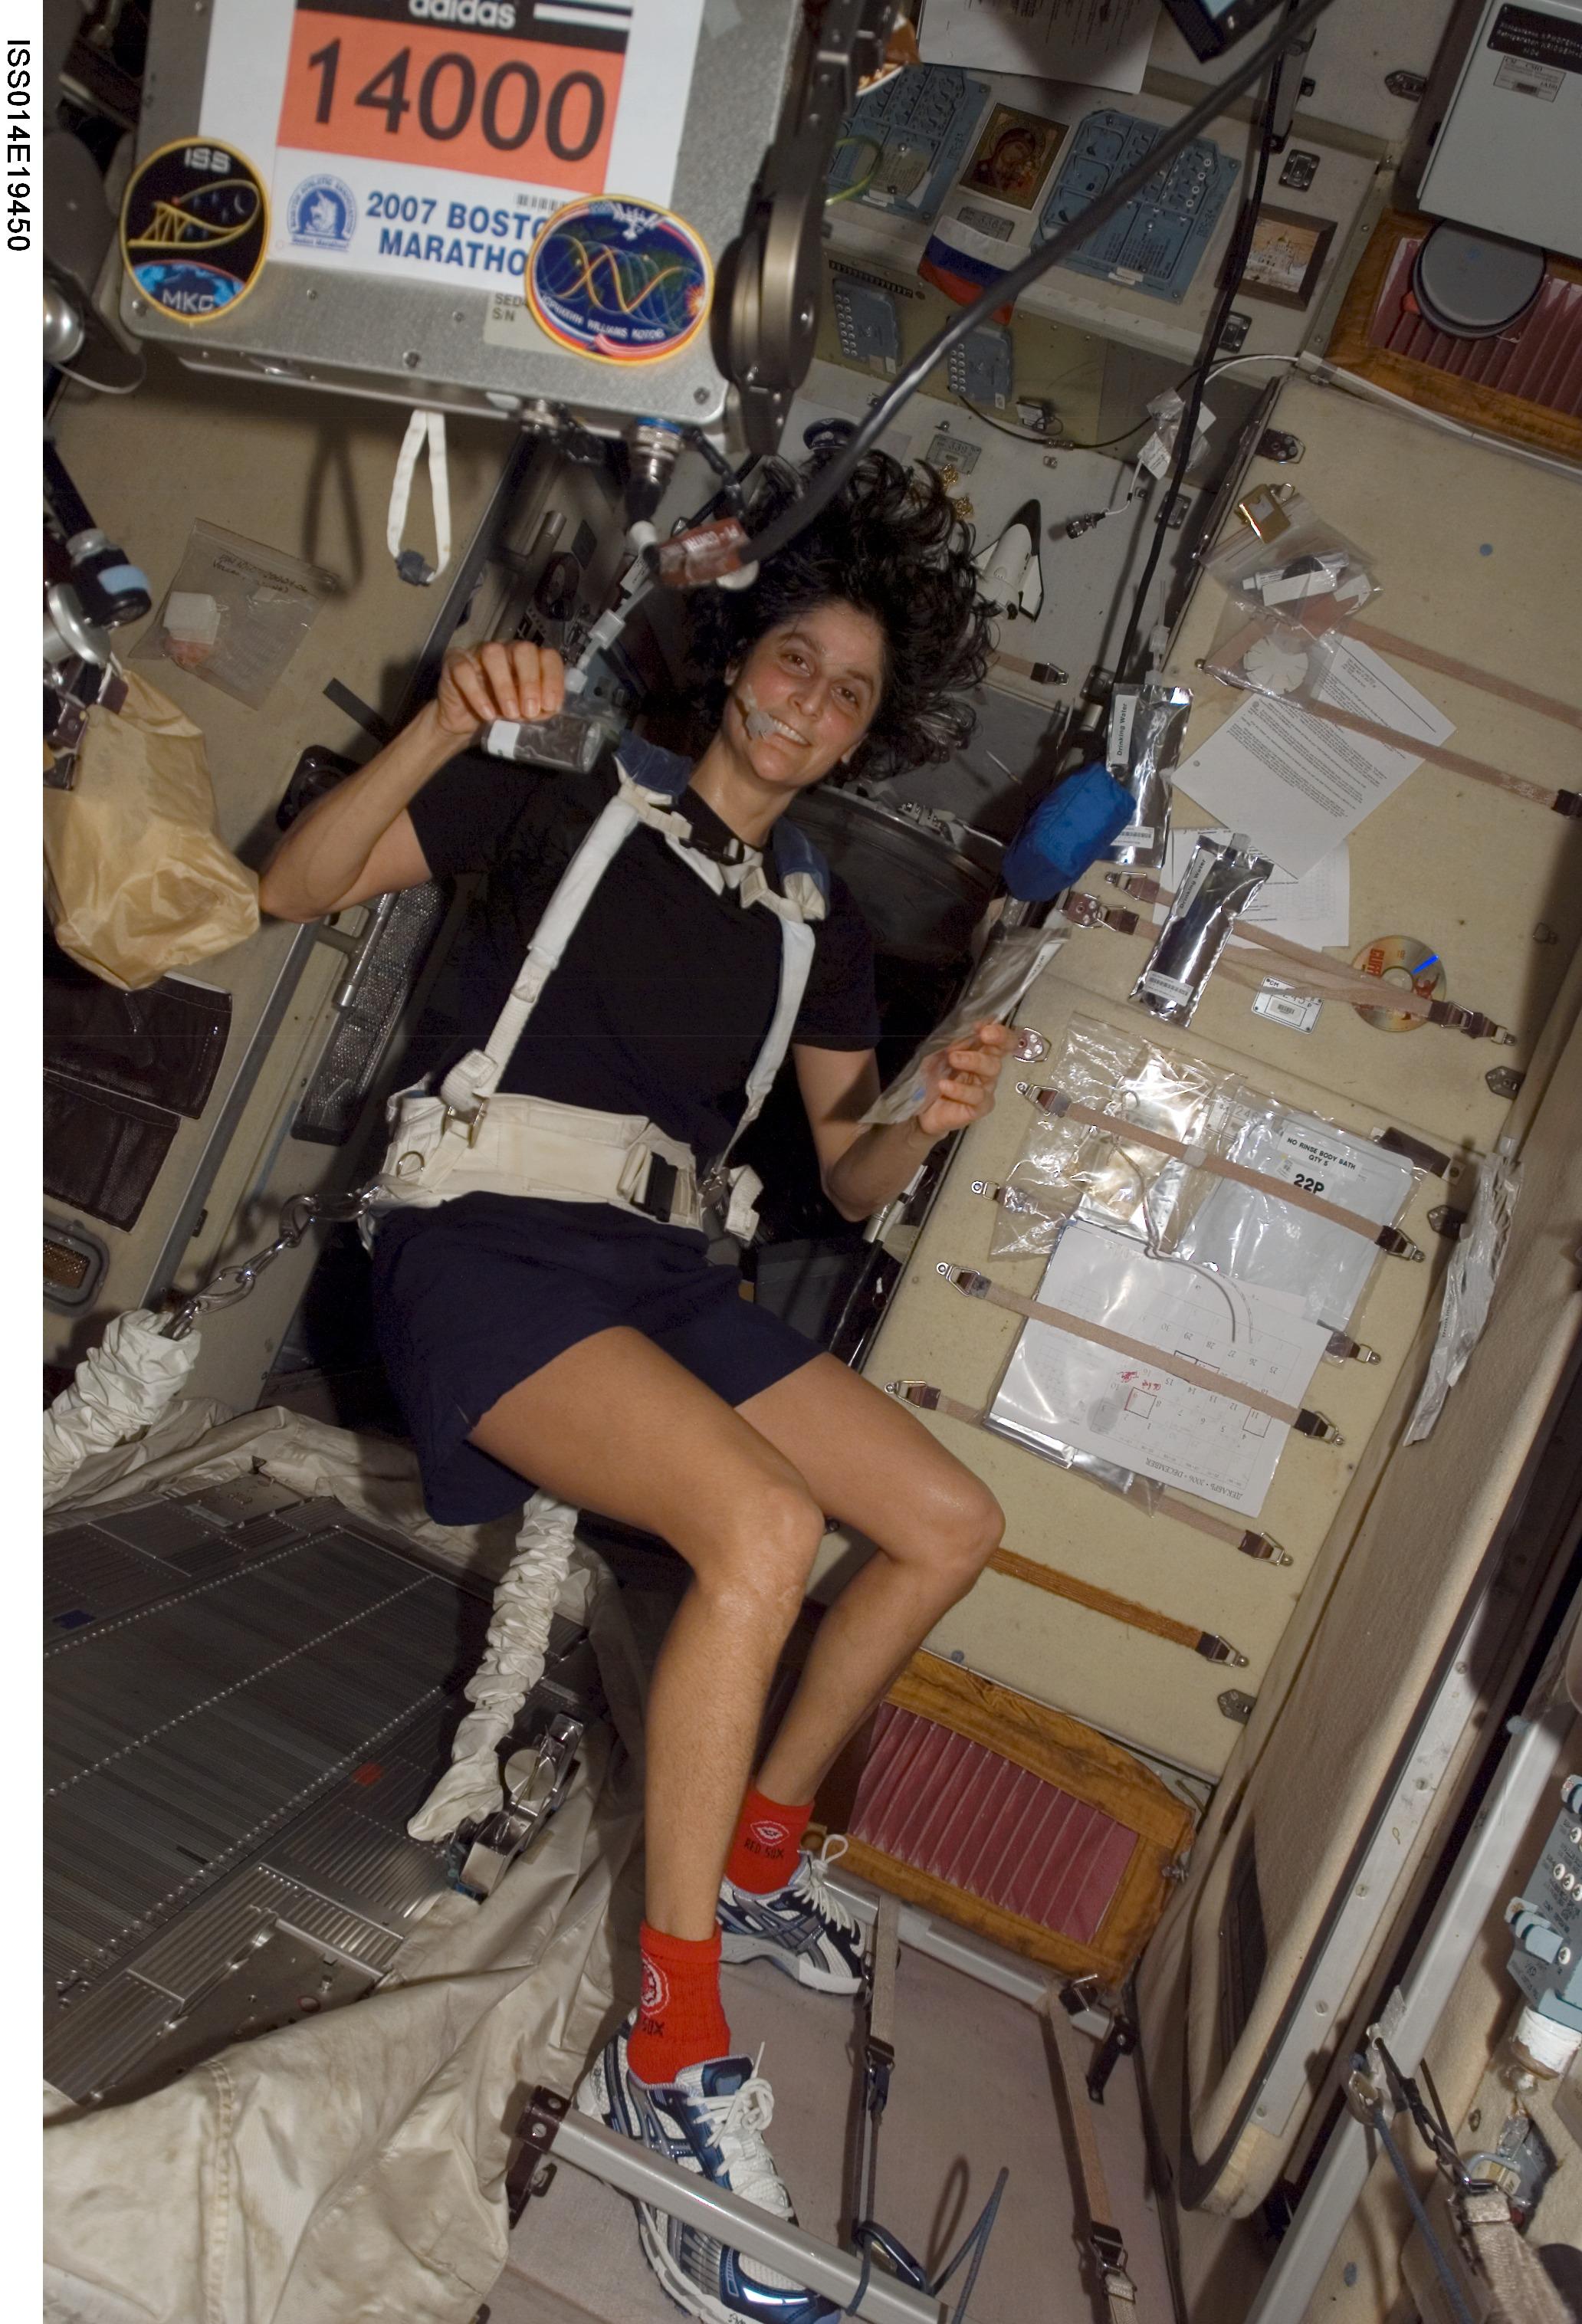 Nasa Williams Runs Boston Marathon Aboard Space Station